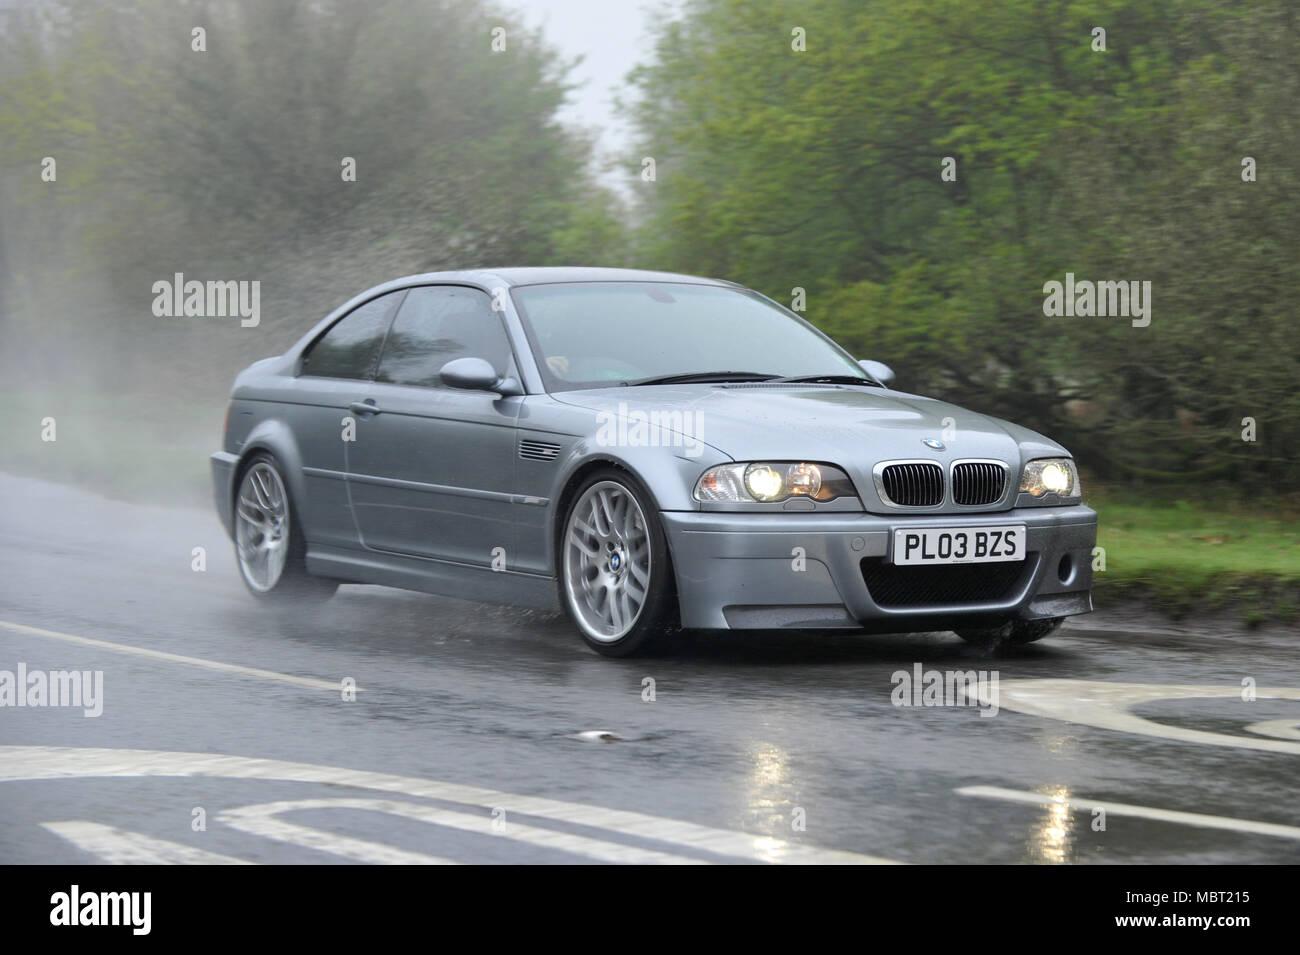 2003 Bmw M3 Csl E92 Shape German Sports Coupe Stock Photo 179393345